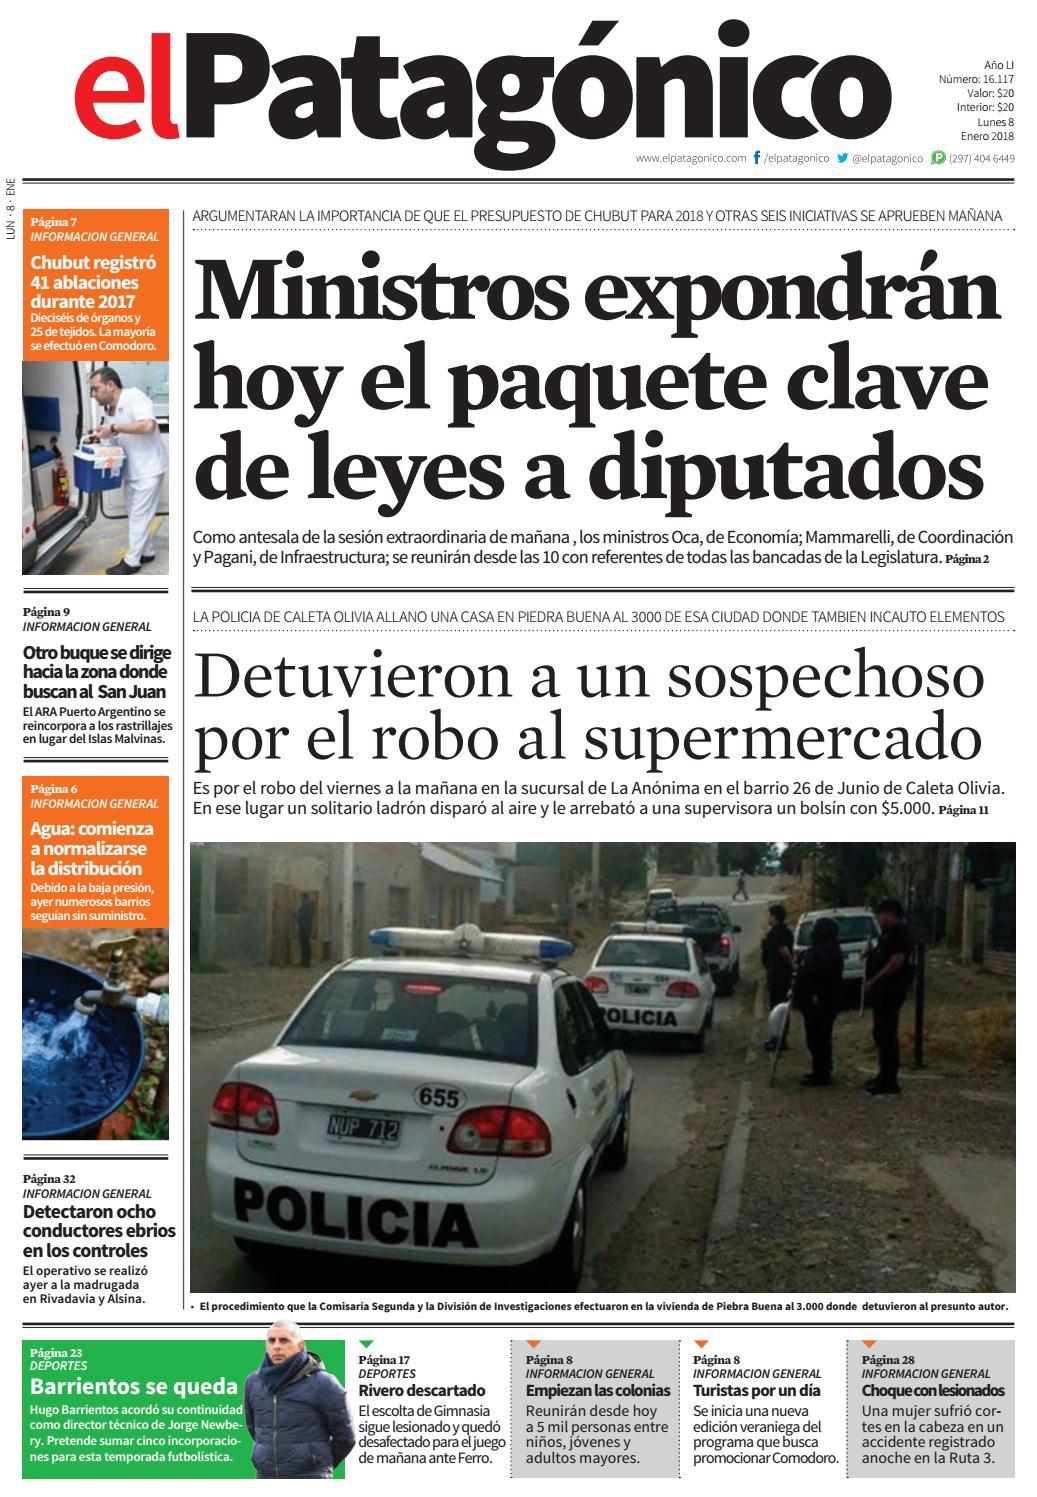 edicion223007012018.pdf by El Patagonico - issuu